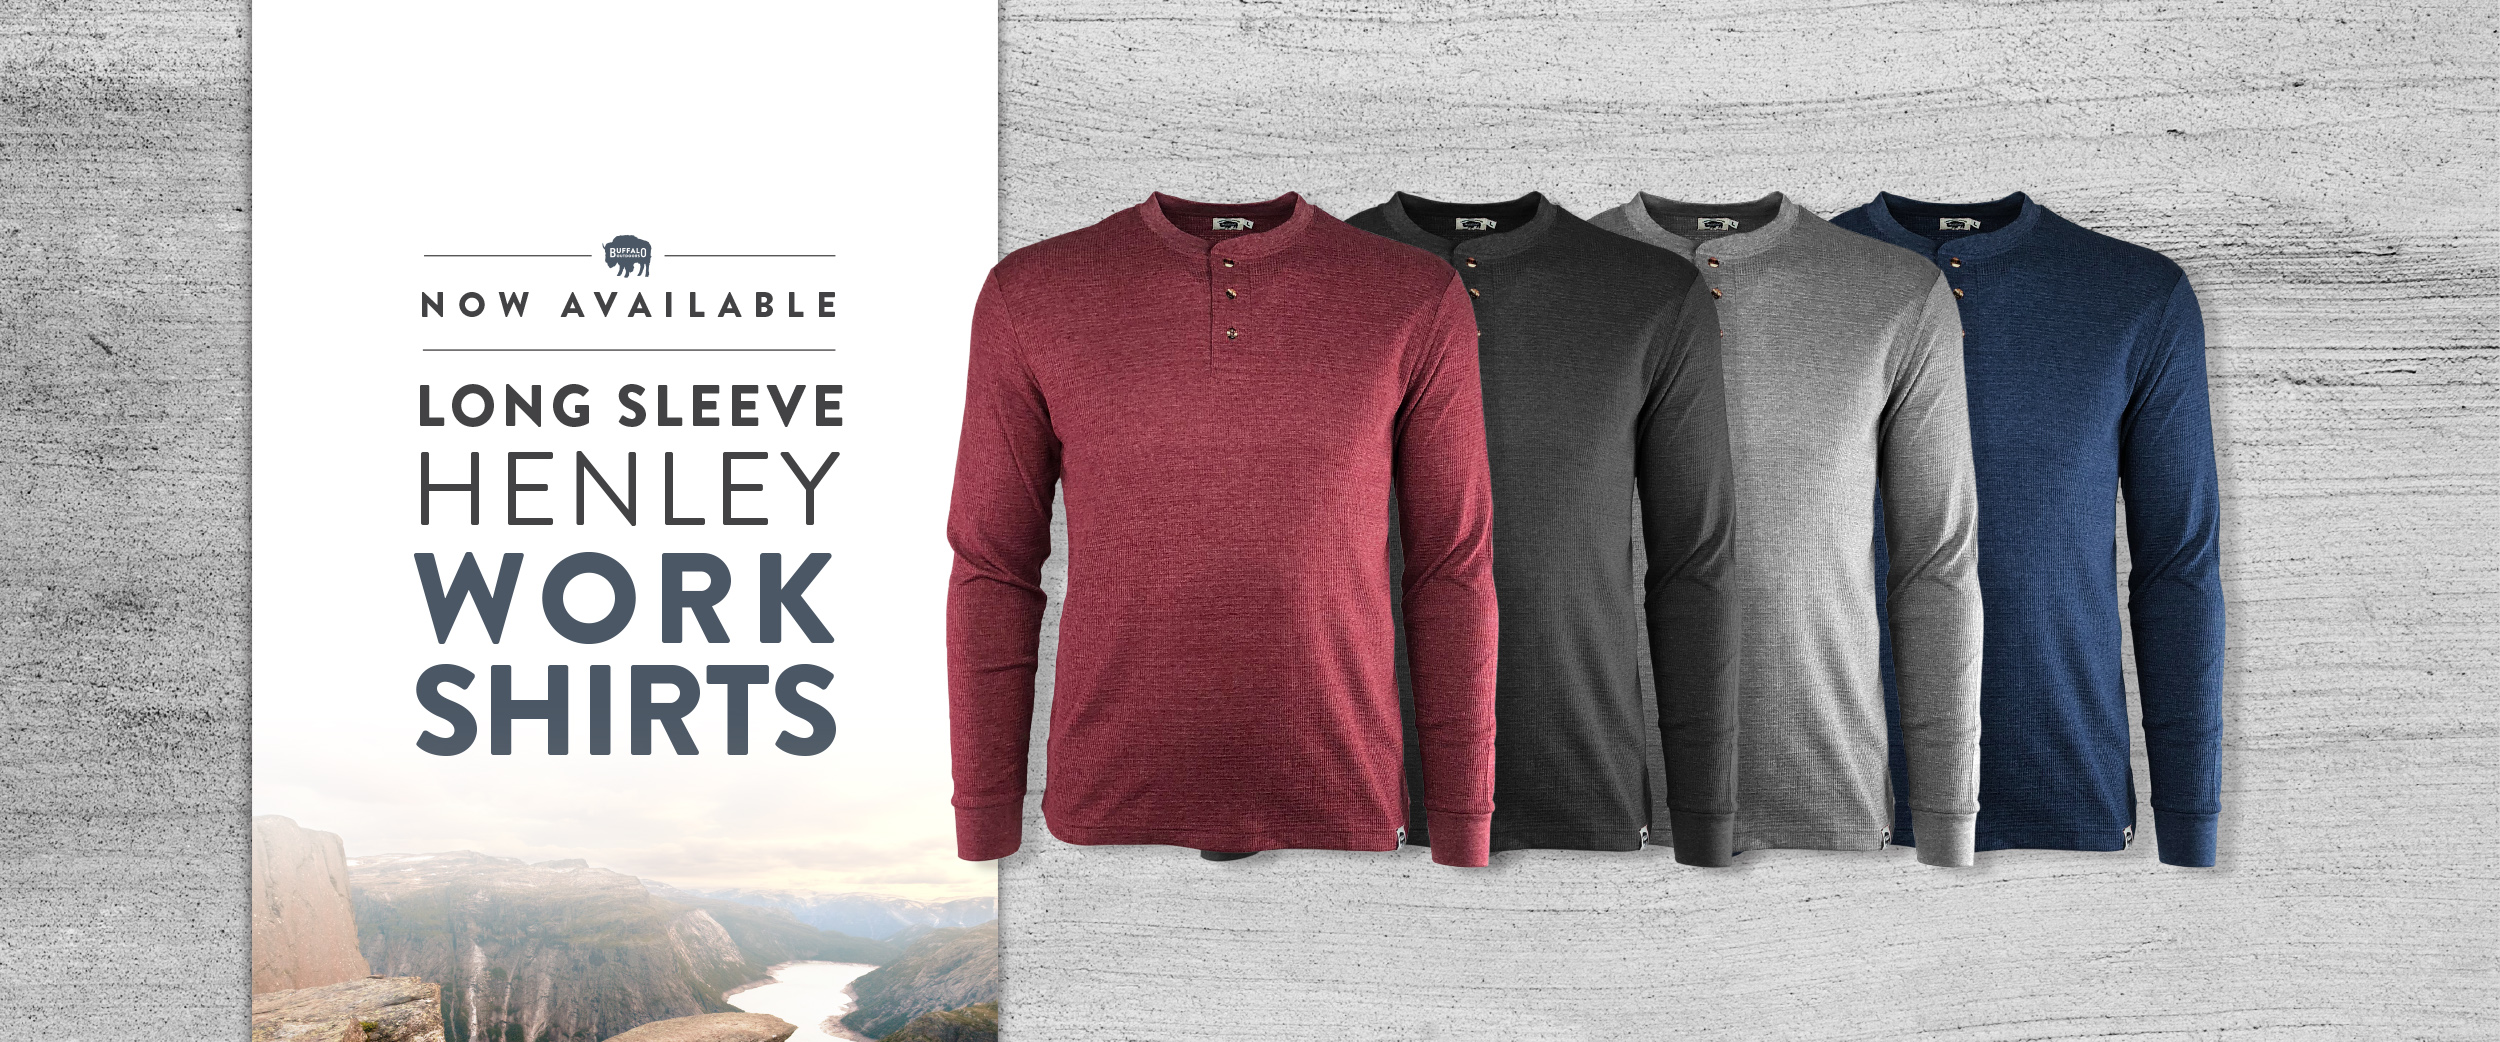 Buffalo Outdoors Long Sleeve Textured Work Henley Shirts